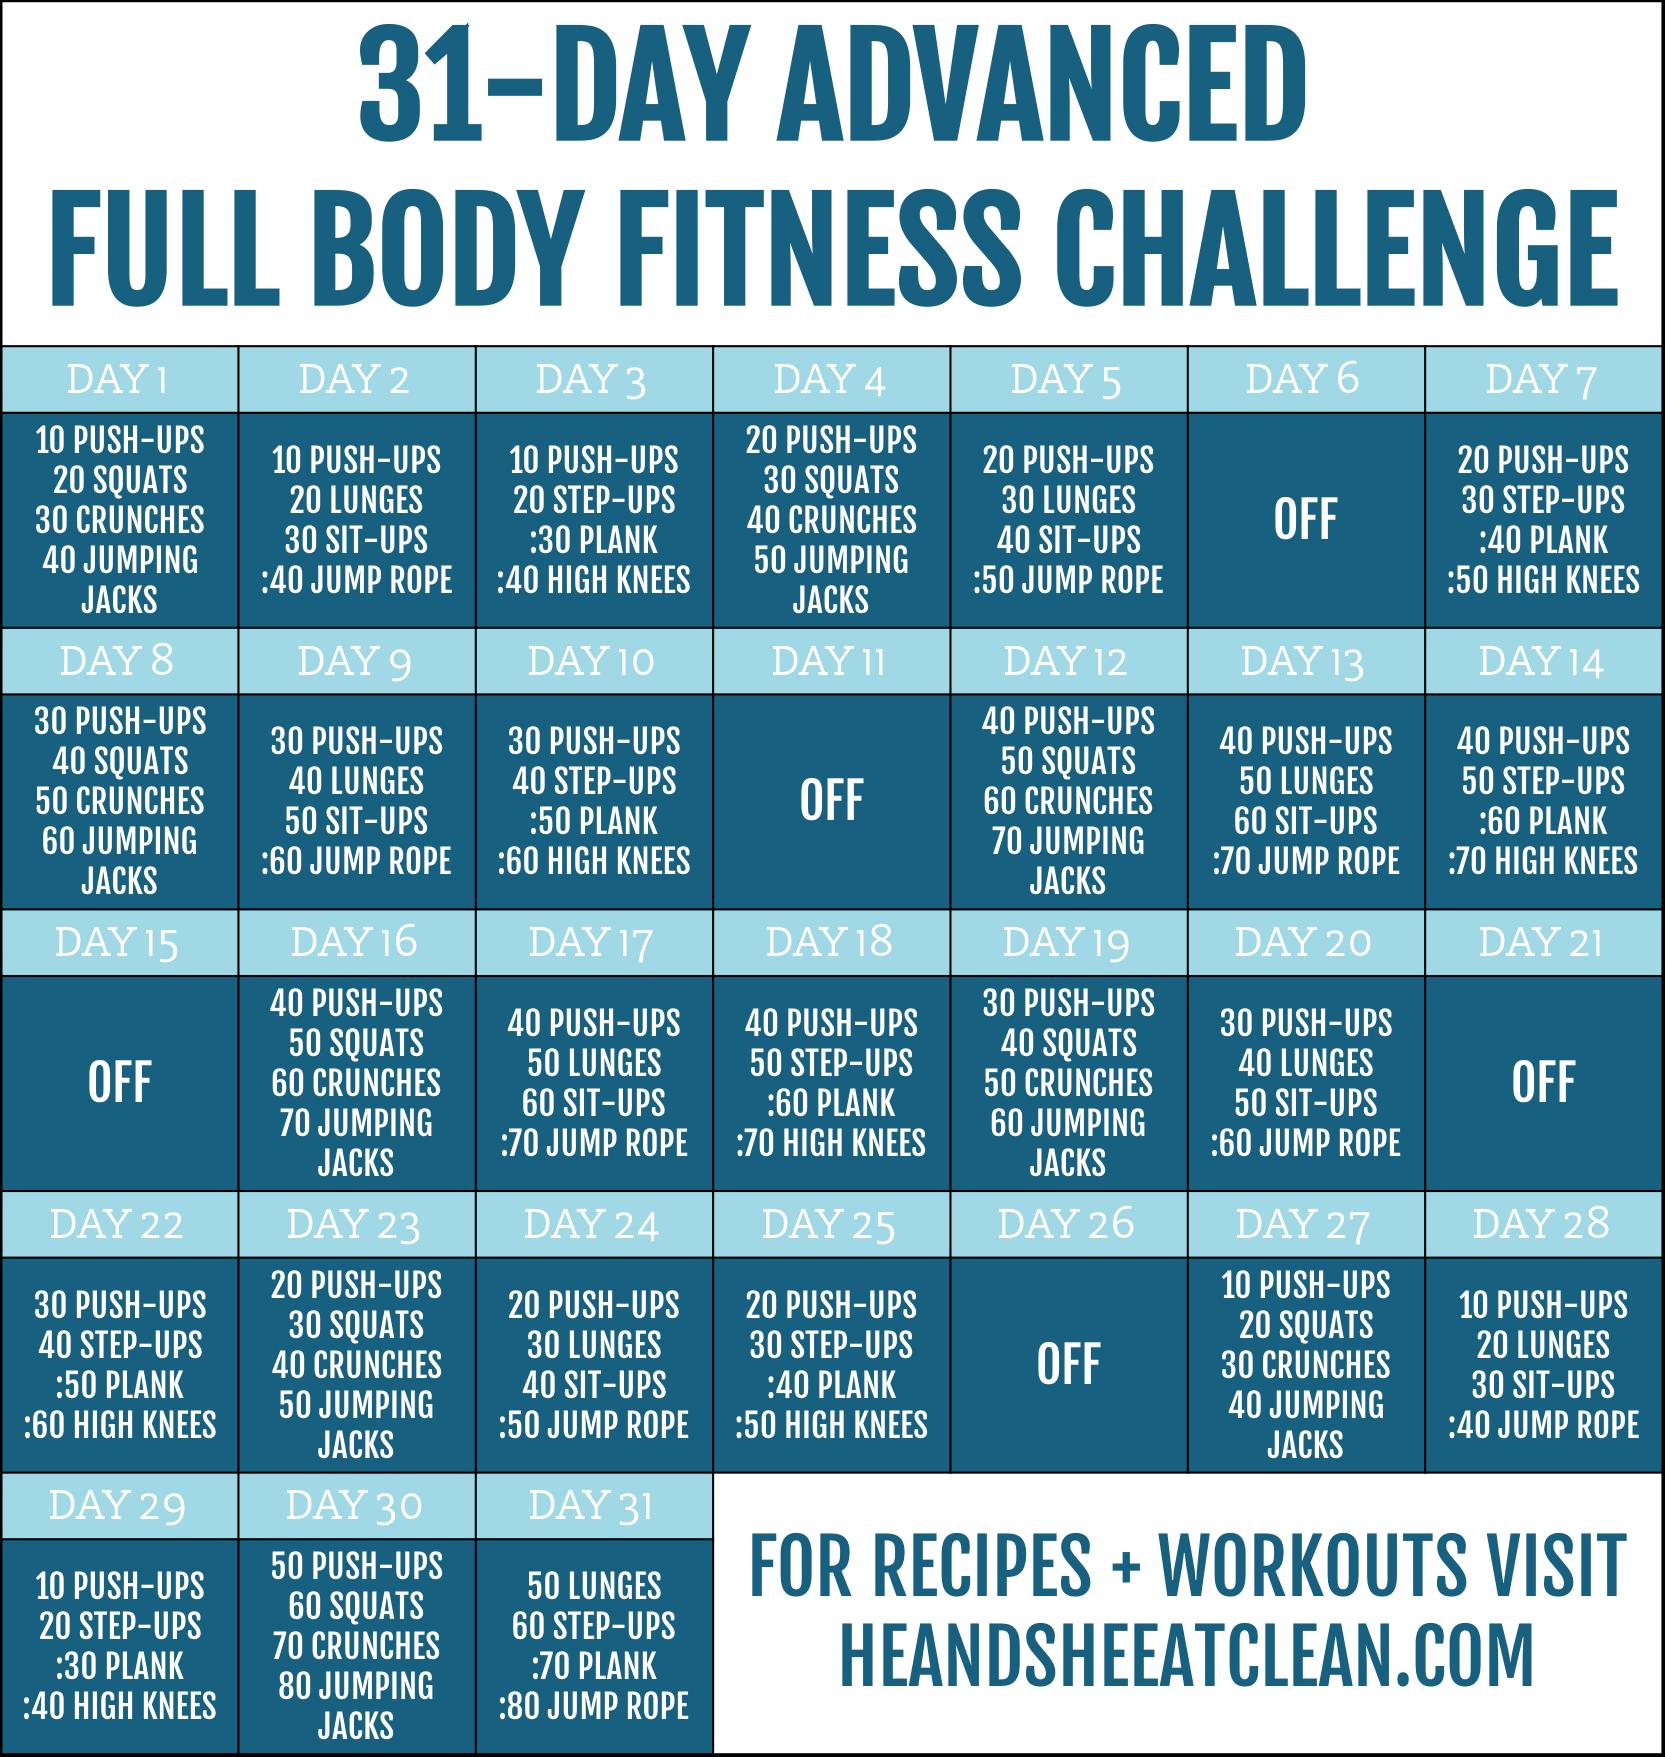 31-Day Advanced Full Body Fitness Challenge